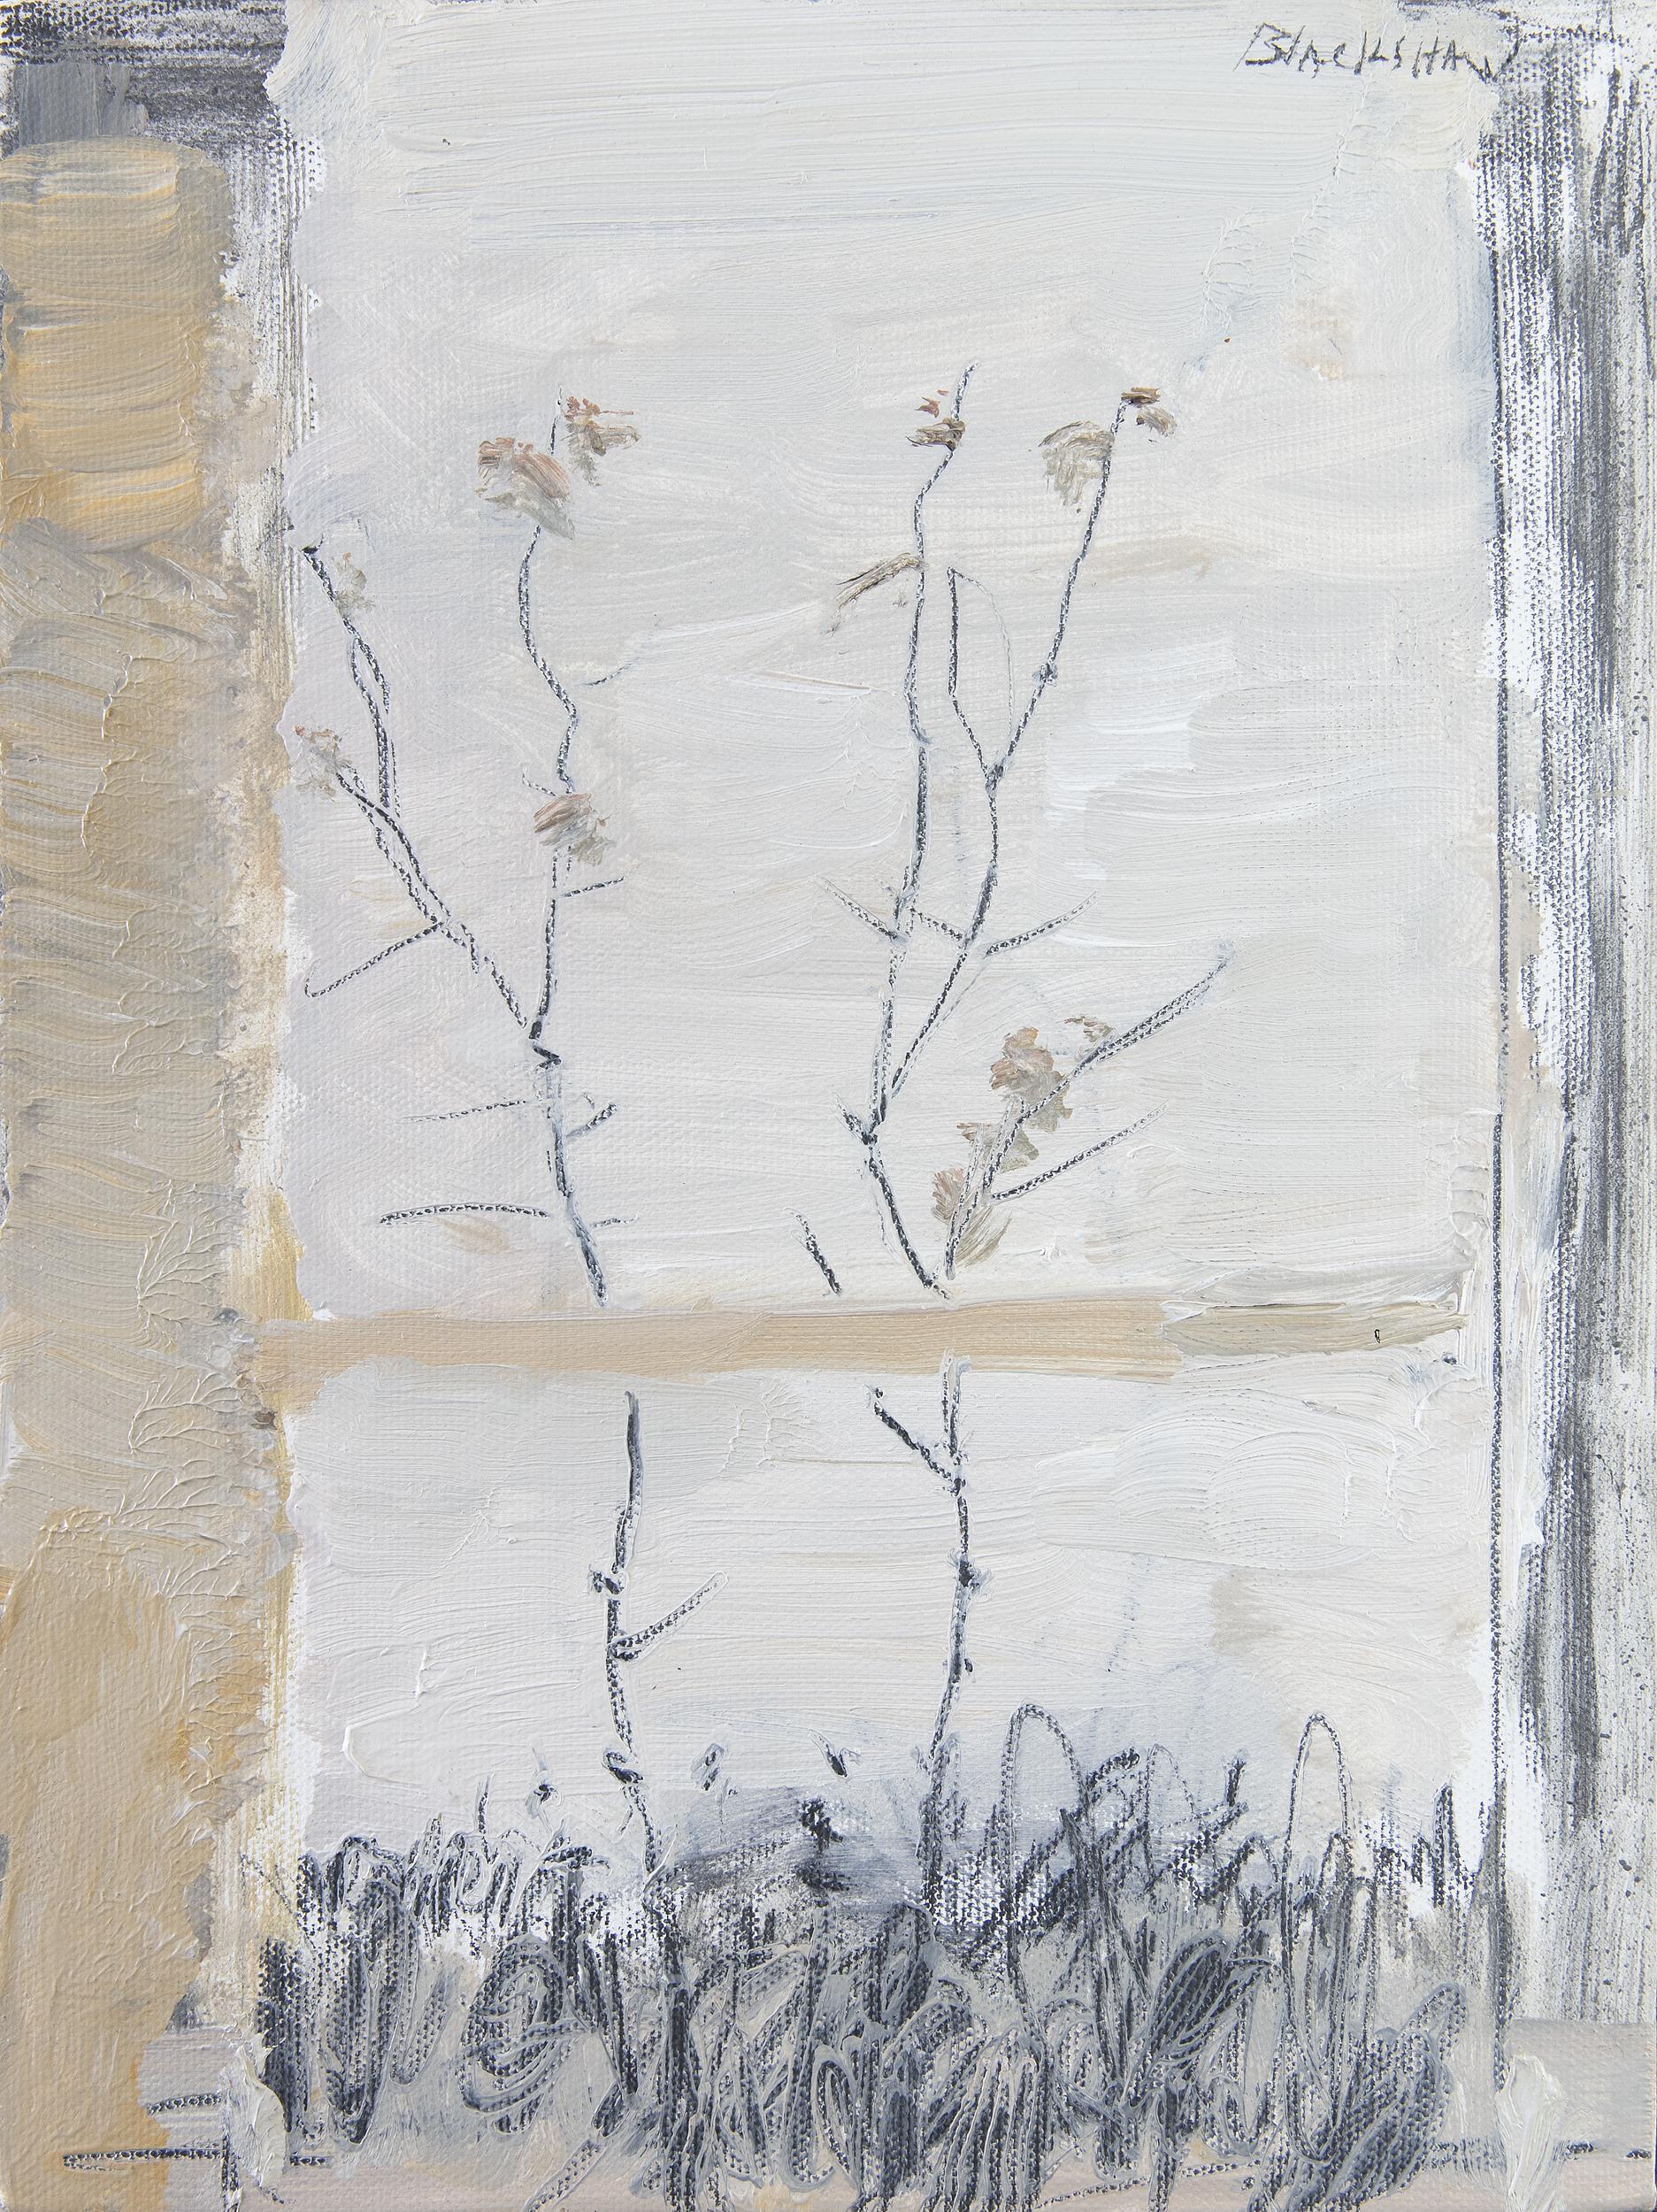 Lot 22 - Basil Blackshaw HRHA RUA (1932-2016)Wild FlowersOil on canvas, 30 x 22.5cm (11¾ x 8¾)Signed;